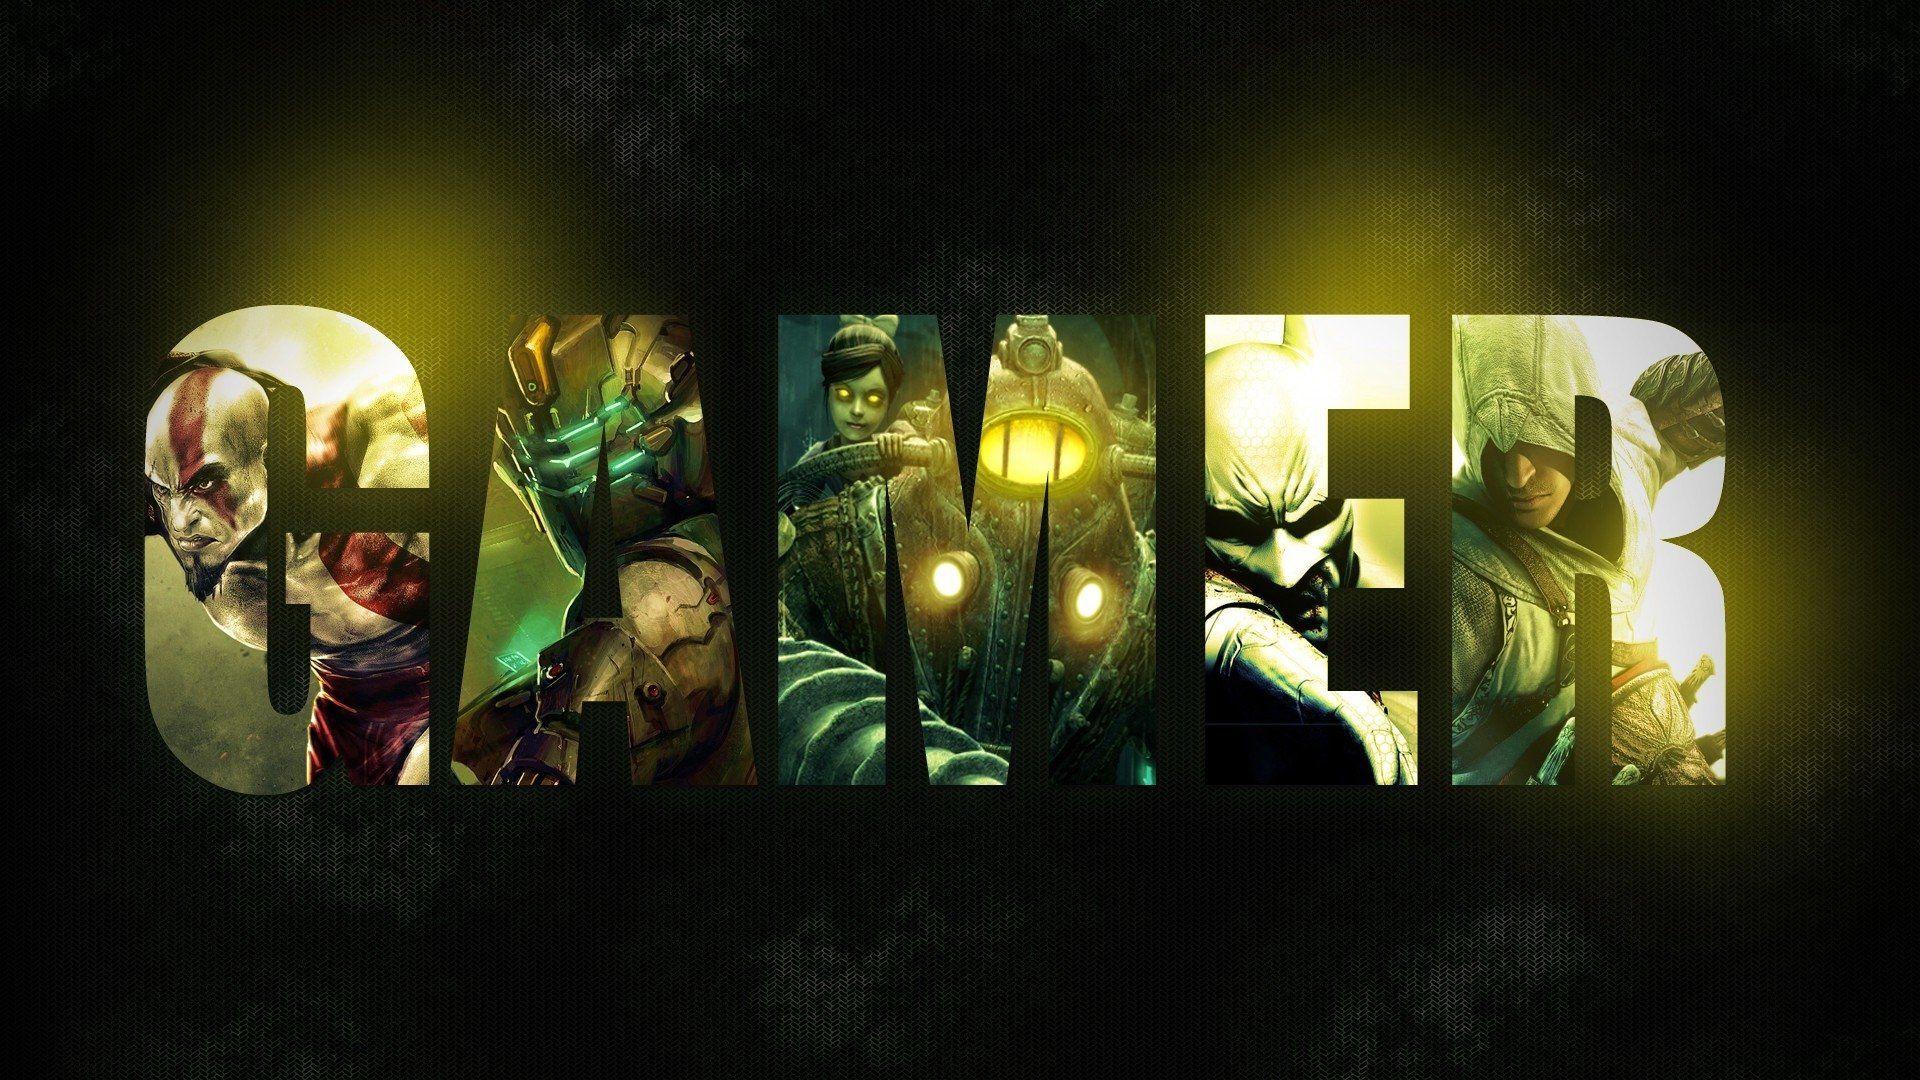 Patreon Best Gaming Wallpapers Gaming Wallpapers Hd Gaming Wallpapers